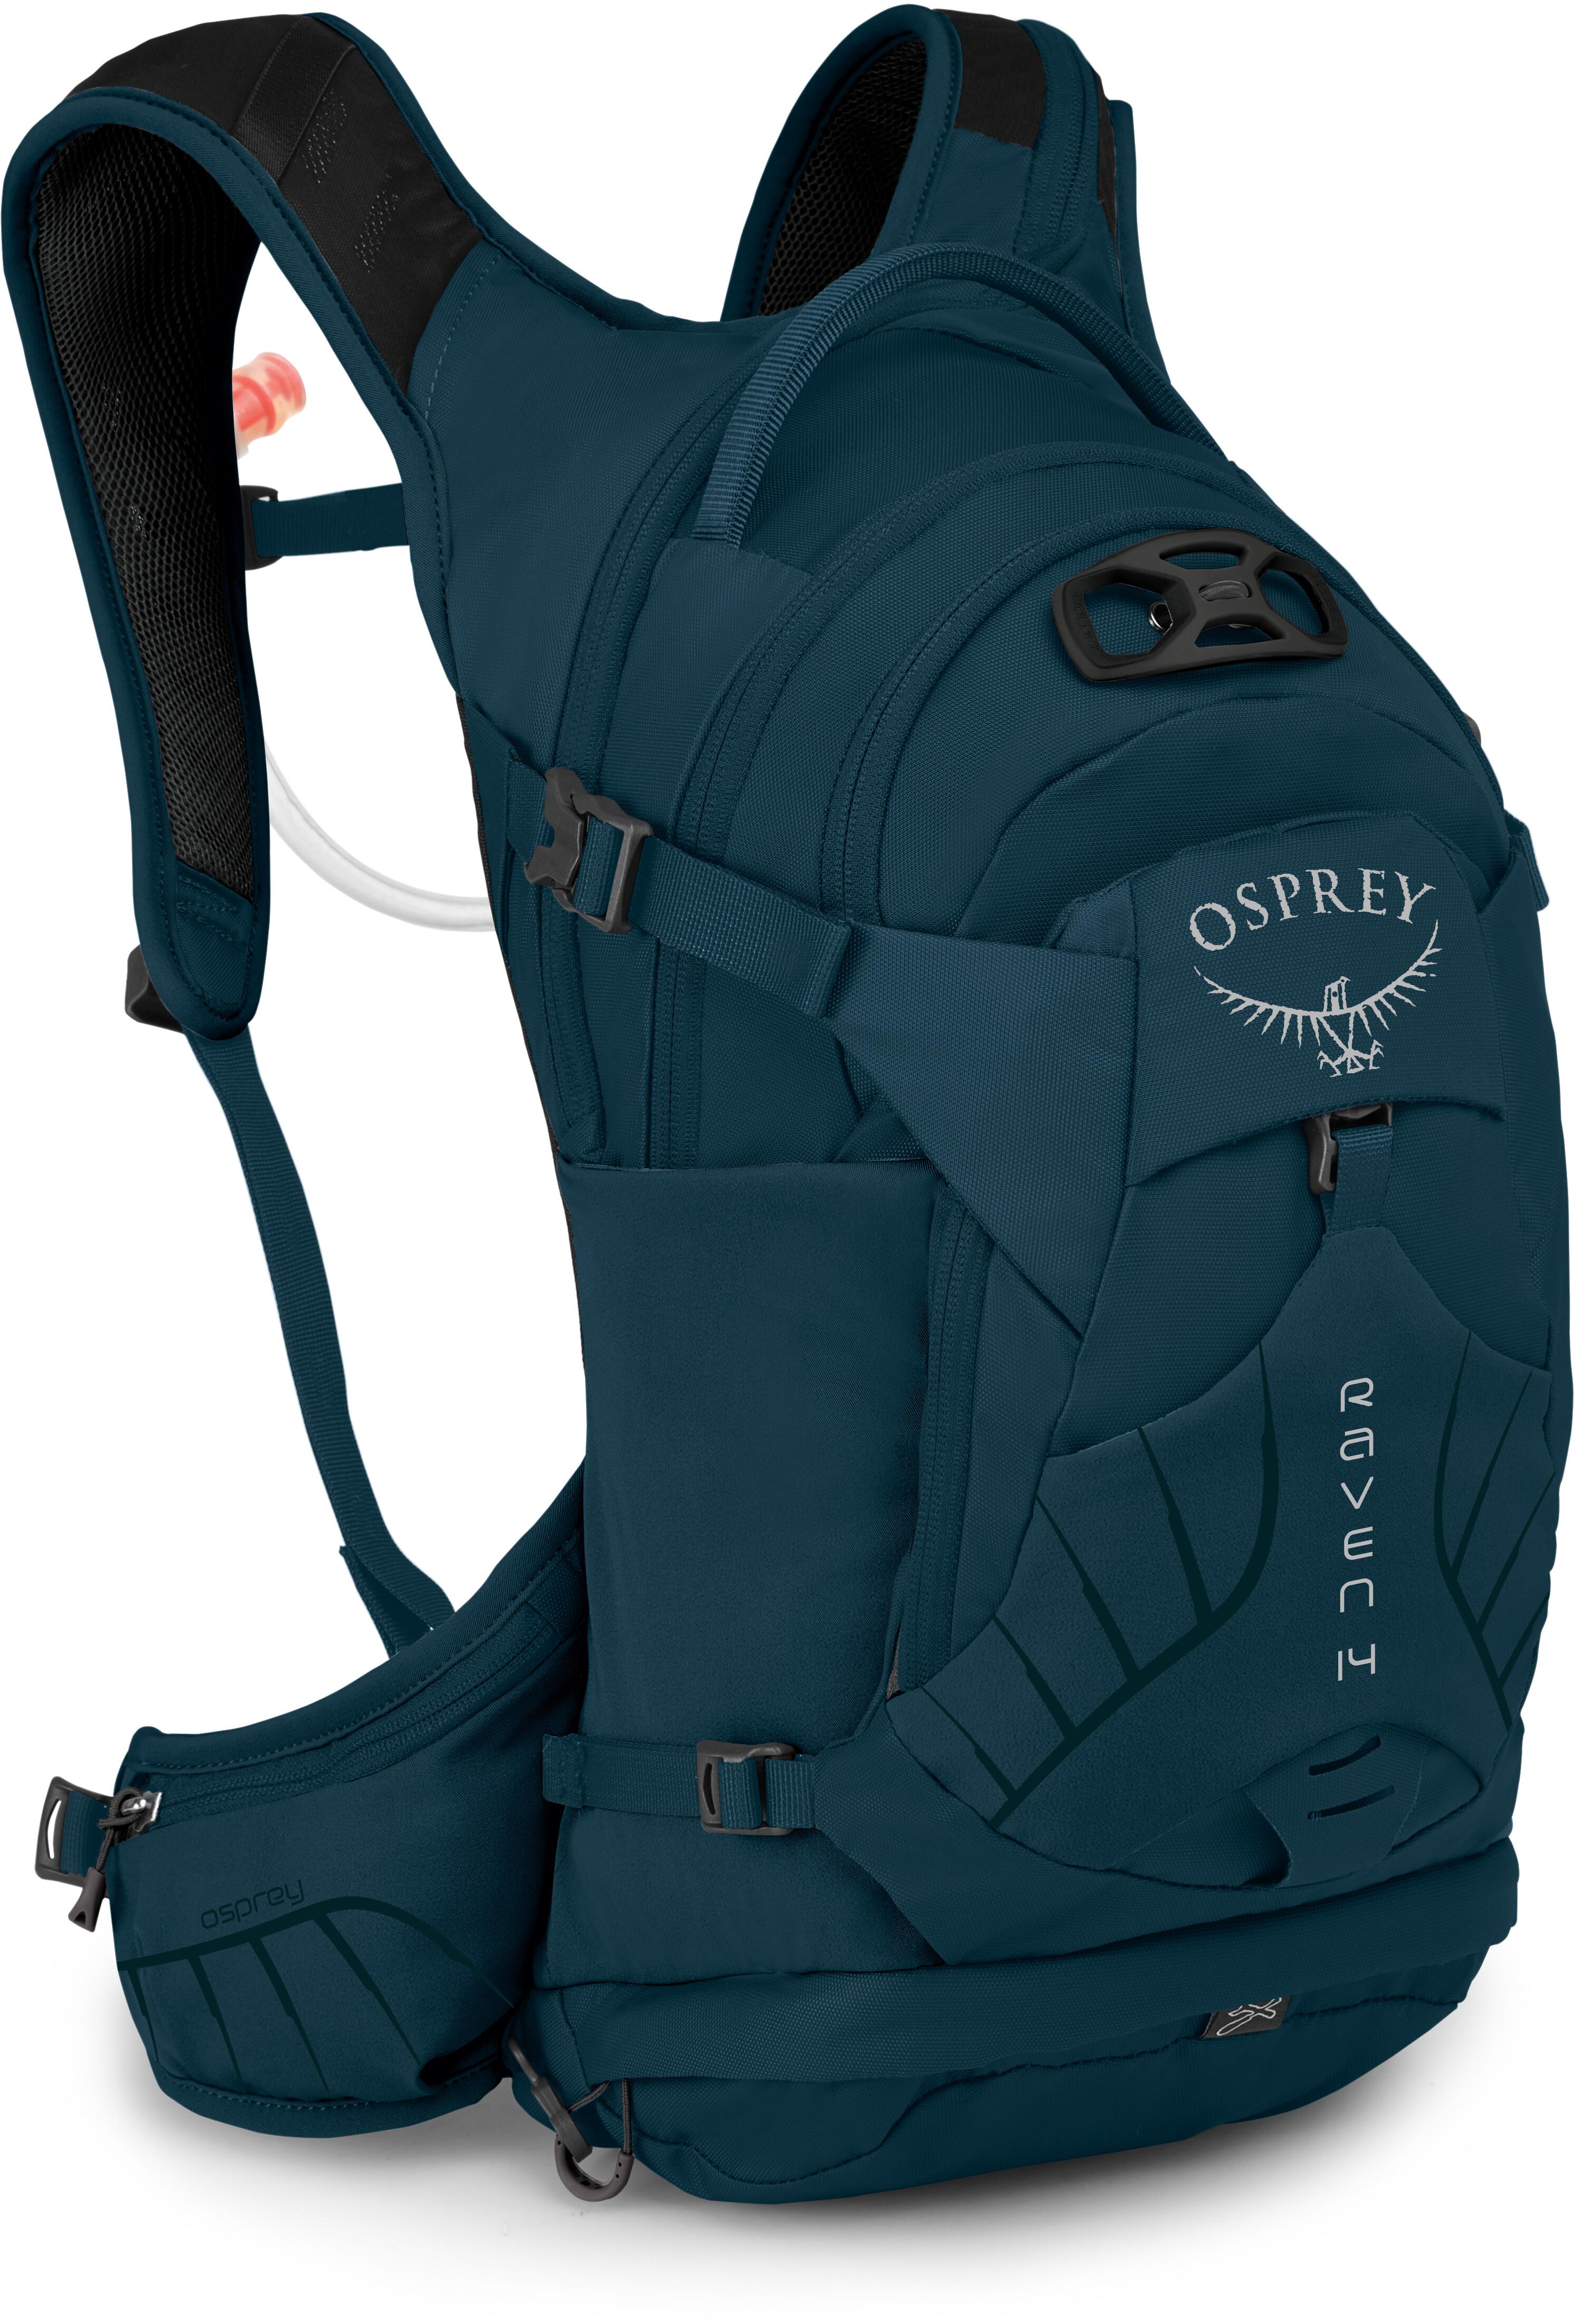 Osprey Raven 14 Ryggsäck Dam blå - till fenomenalt pris på Bikester 3b143a5036c6c